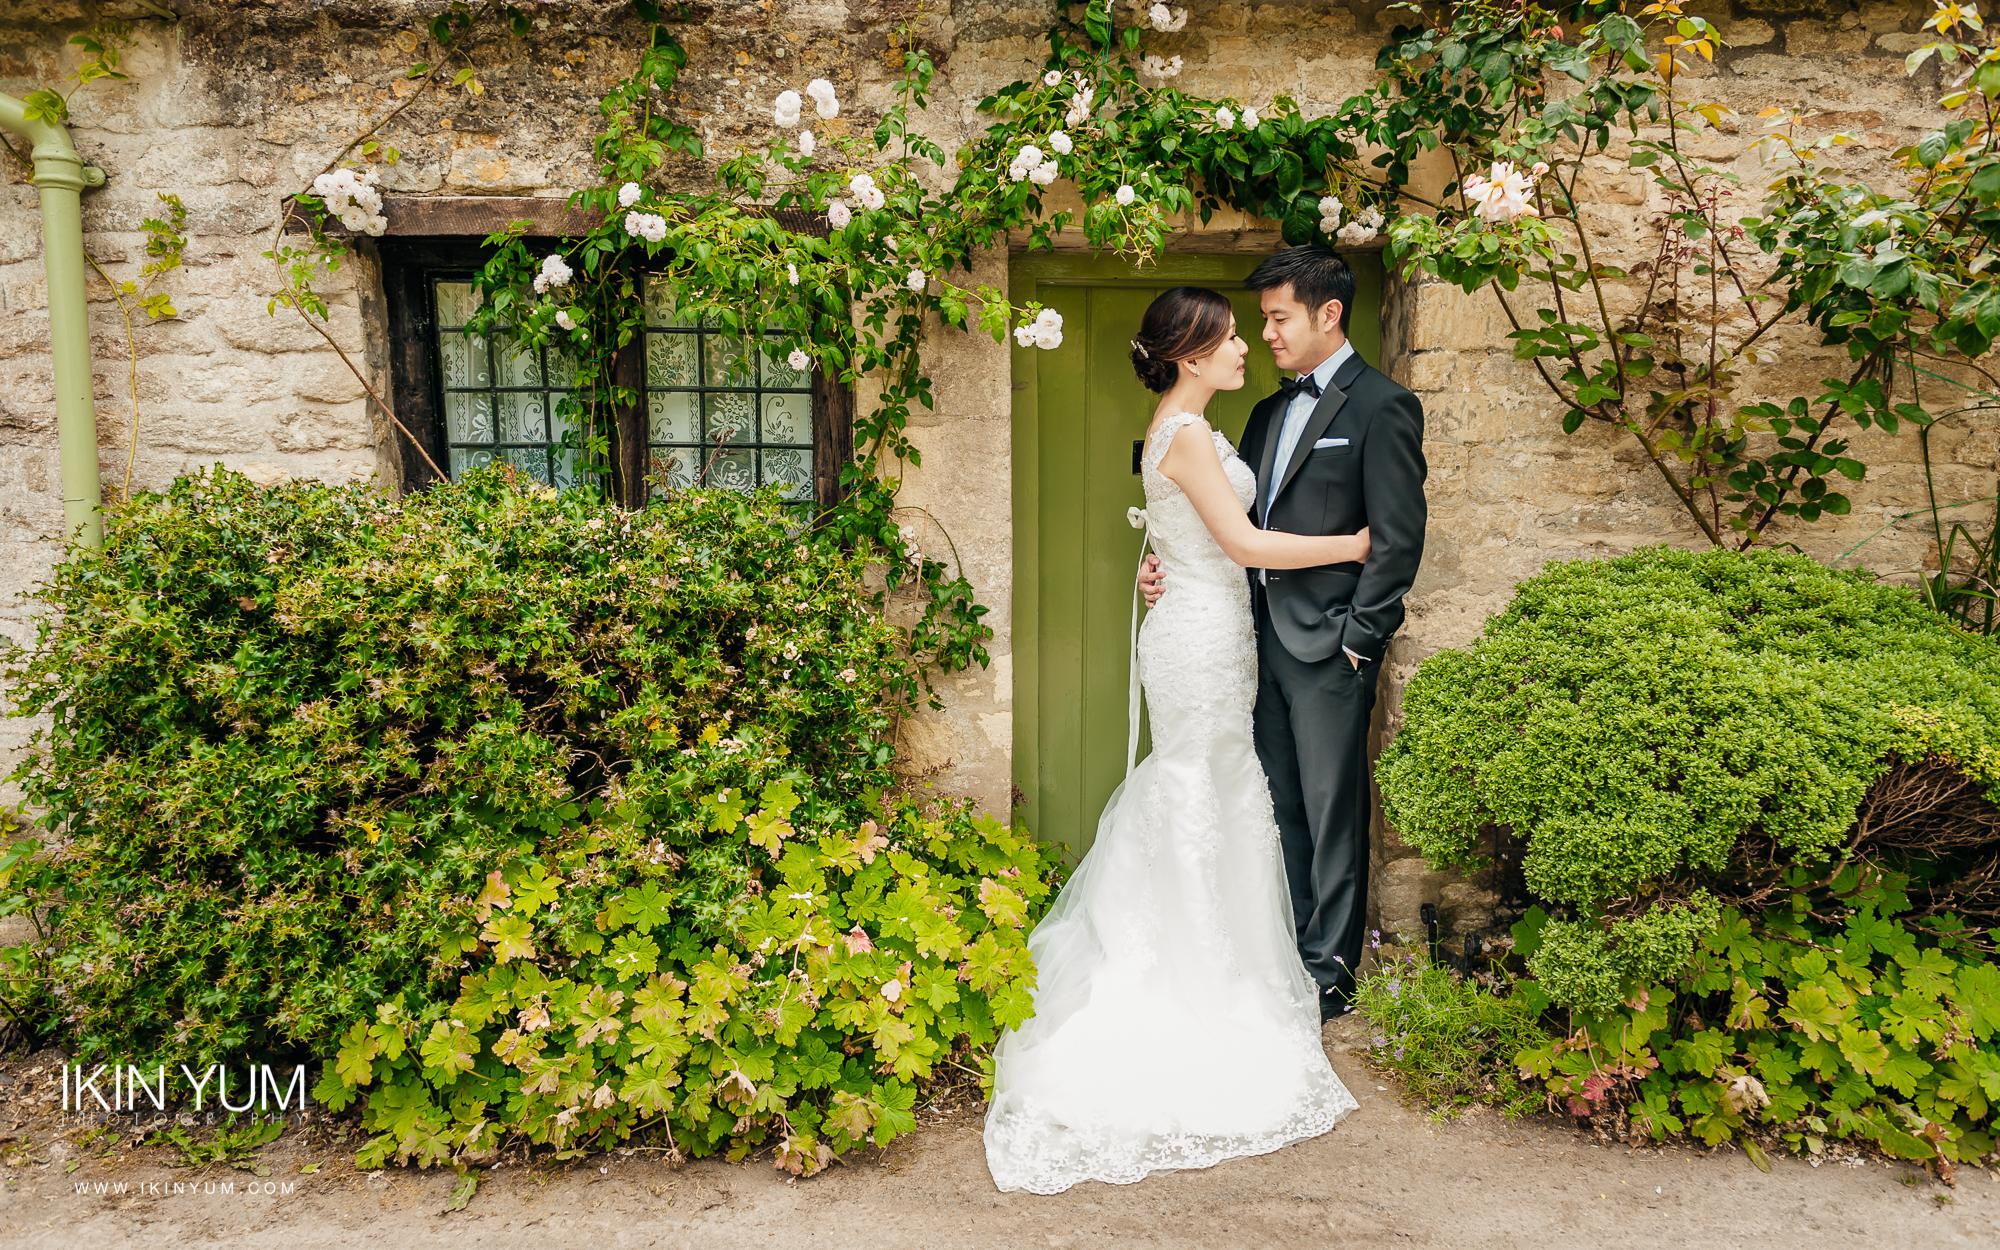 Carmen & Dennis Pre-Wedding Shoot - Ikin Yum Photography-021.jpg